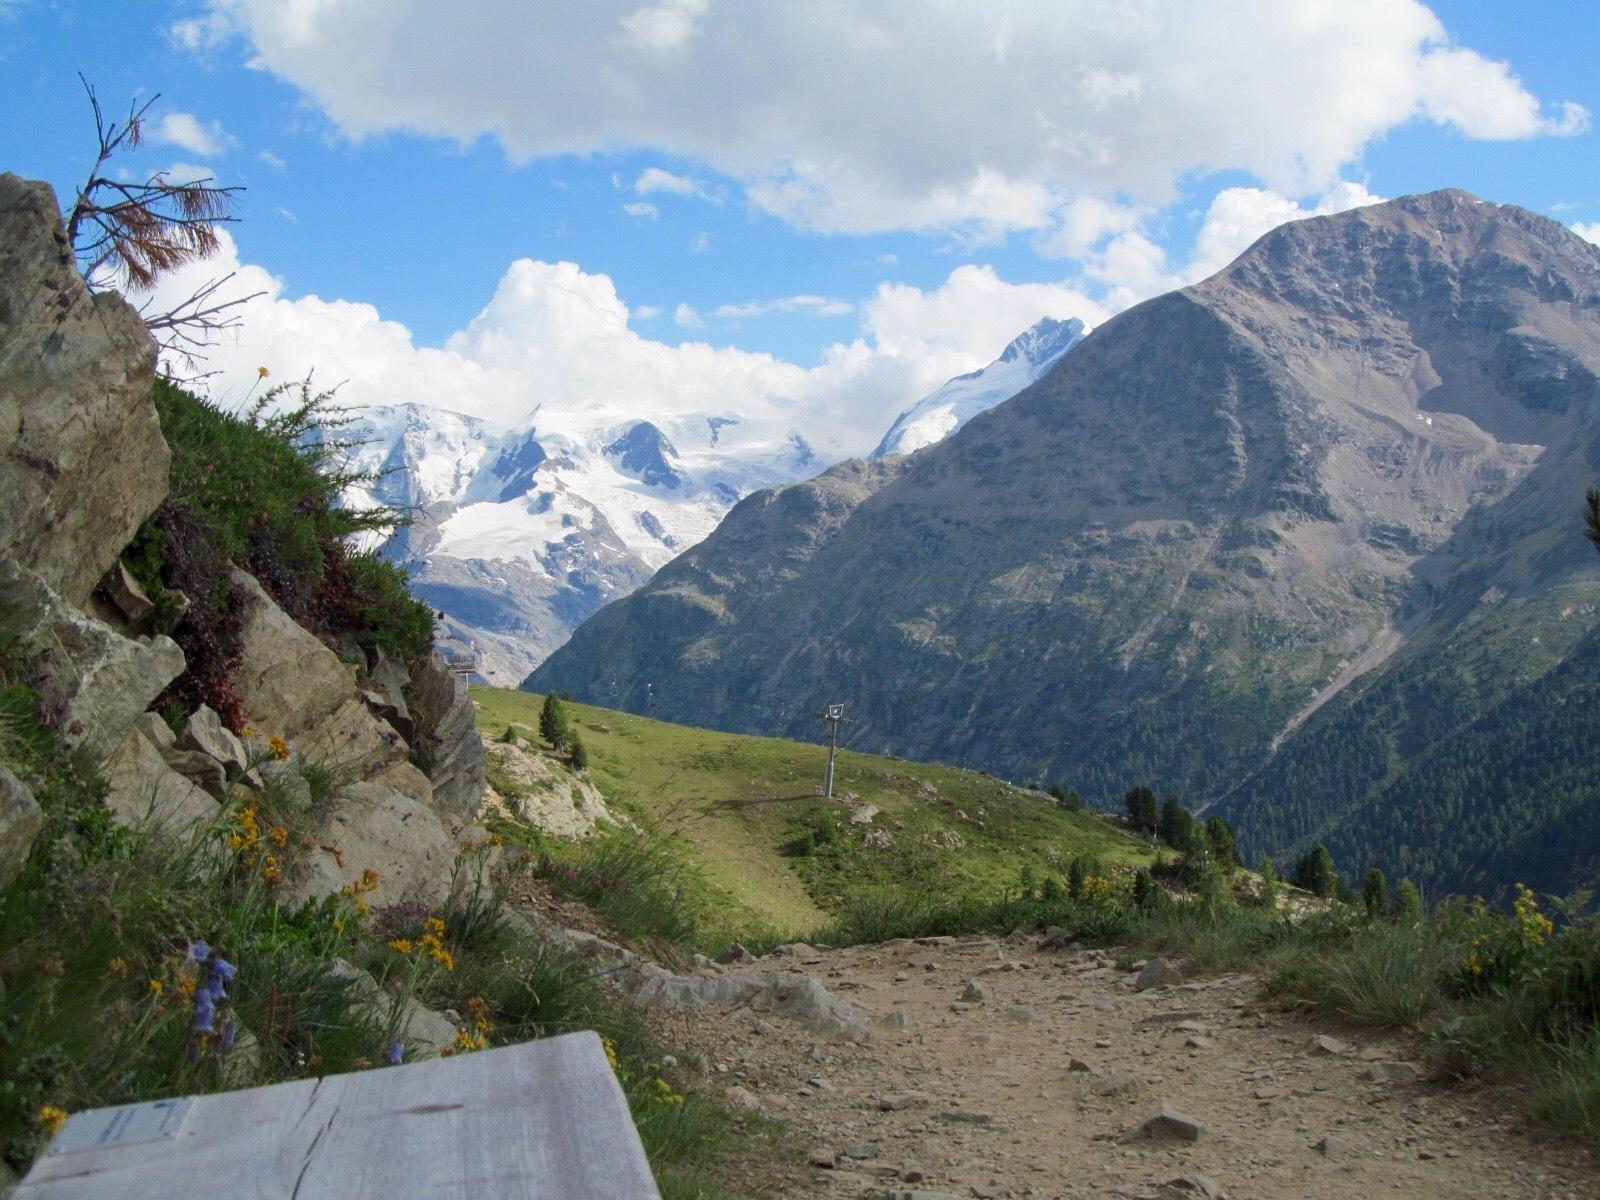 Sitzbänke Panoramaweg Muottas-Muragl - Alp Languard Slide 7